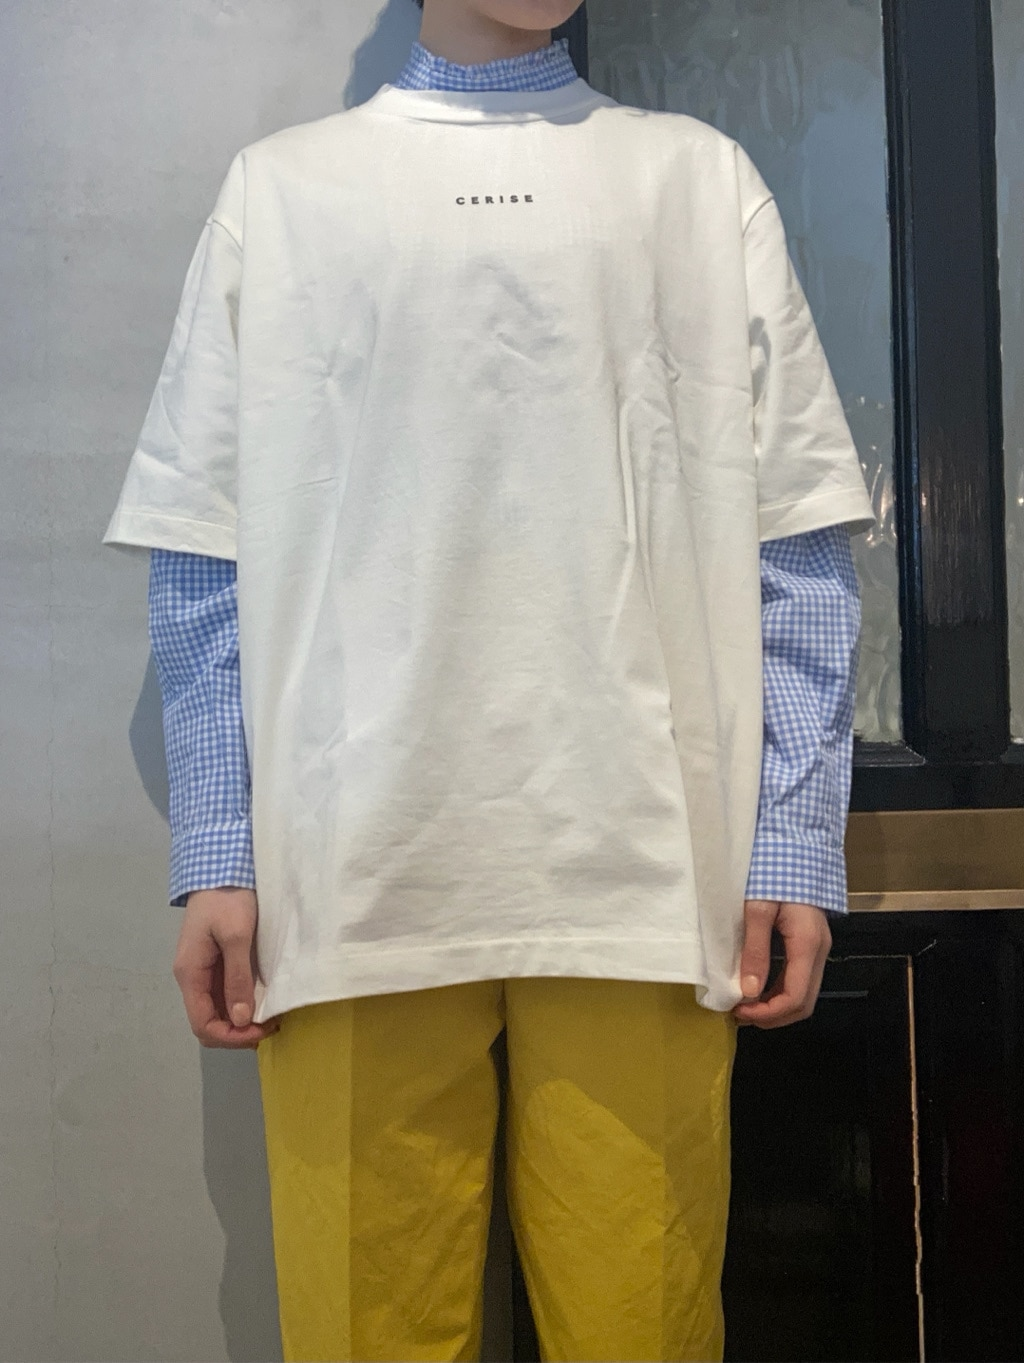 Dot and Stripes CHILD WOMAN 名古屋栄路面 身長:160cm 2021.04.10